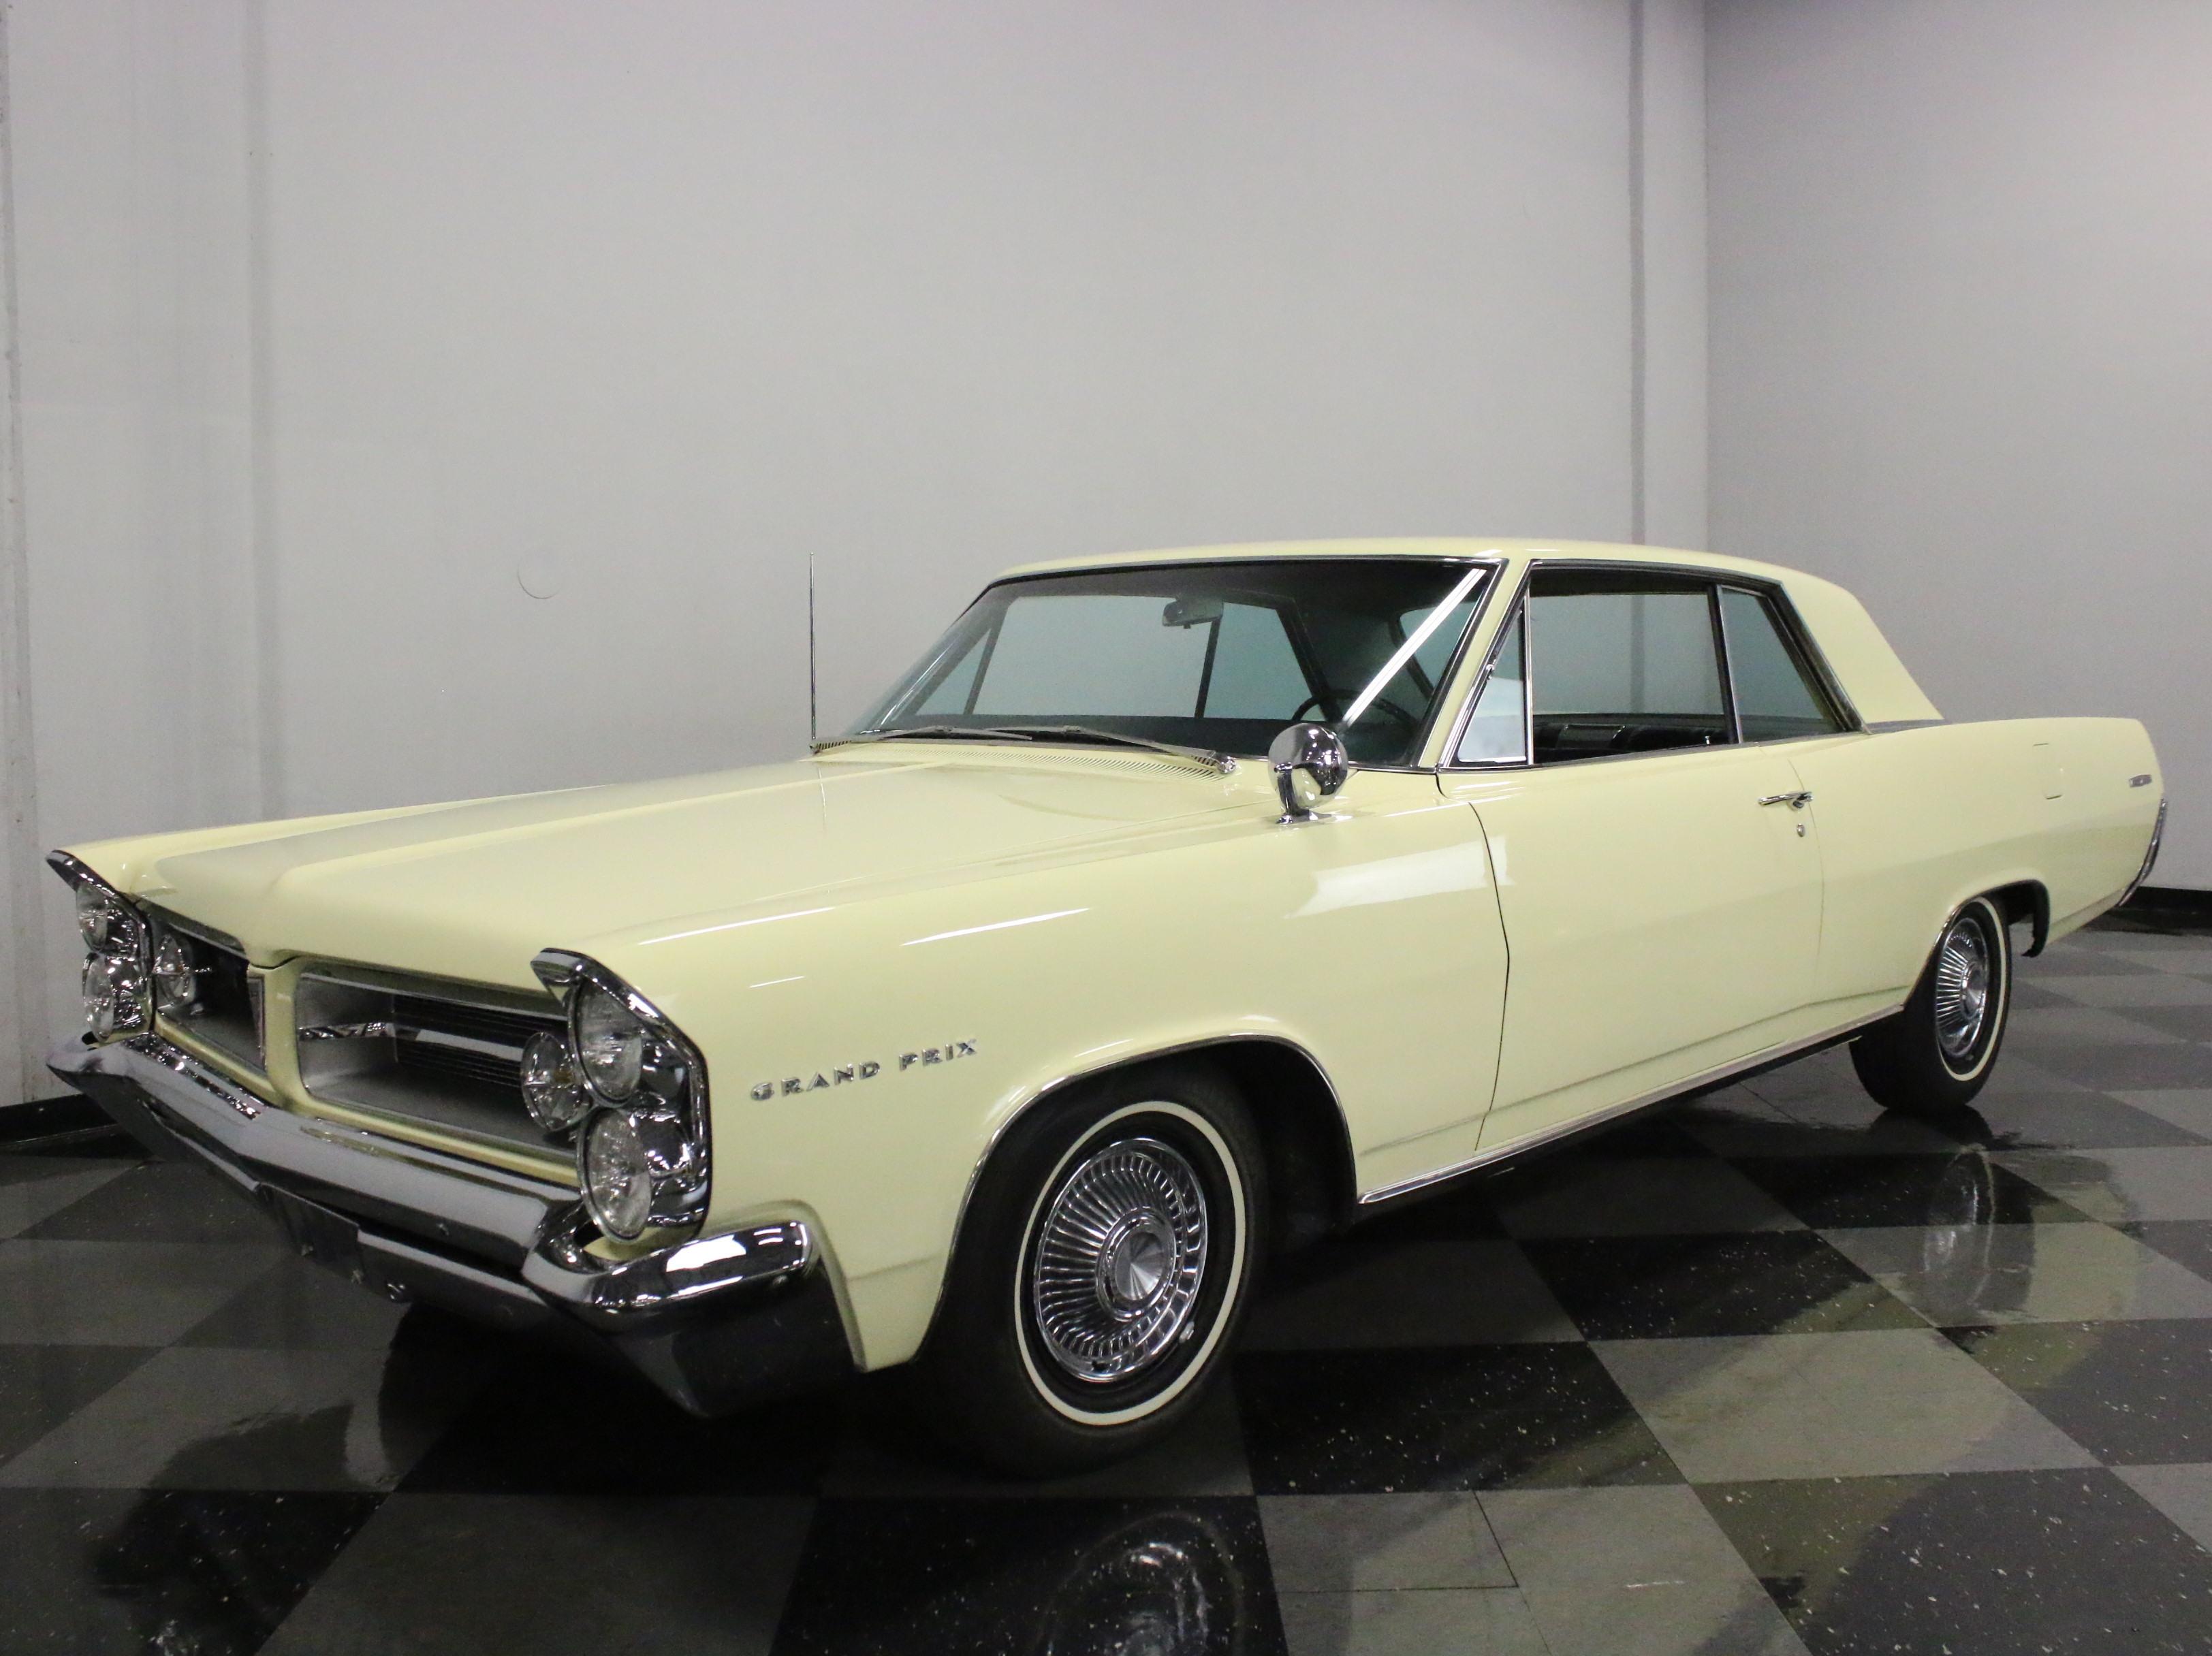 1963 Pontiac Grand Prix | eBay